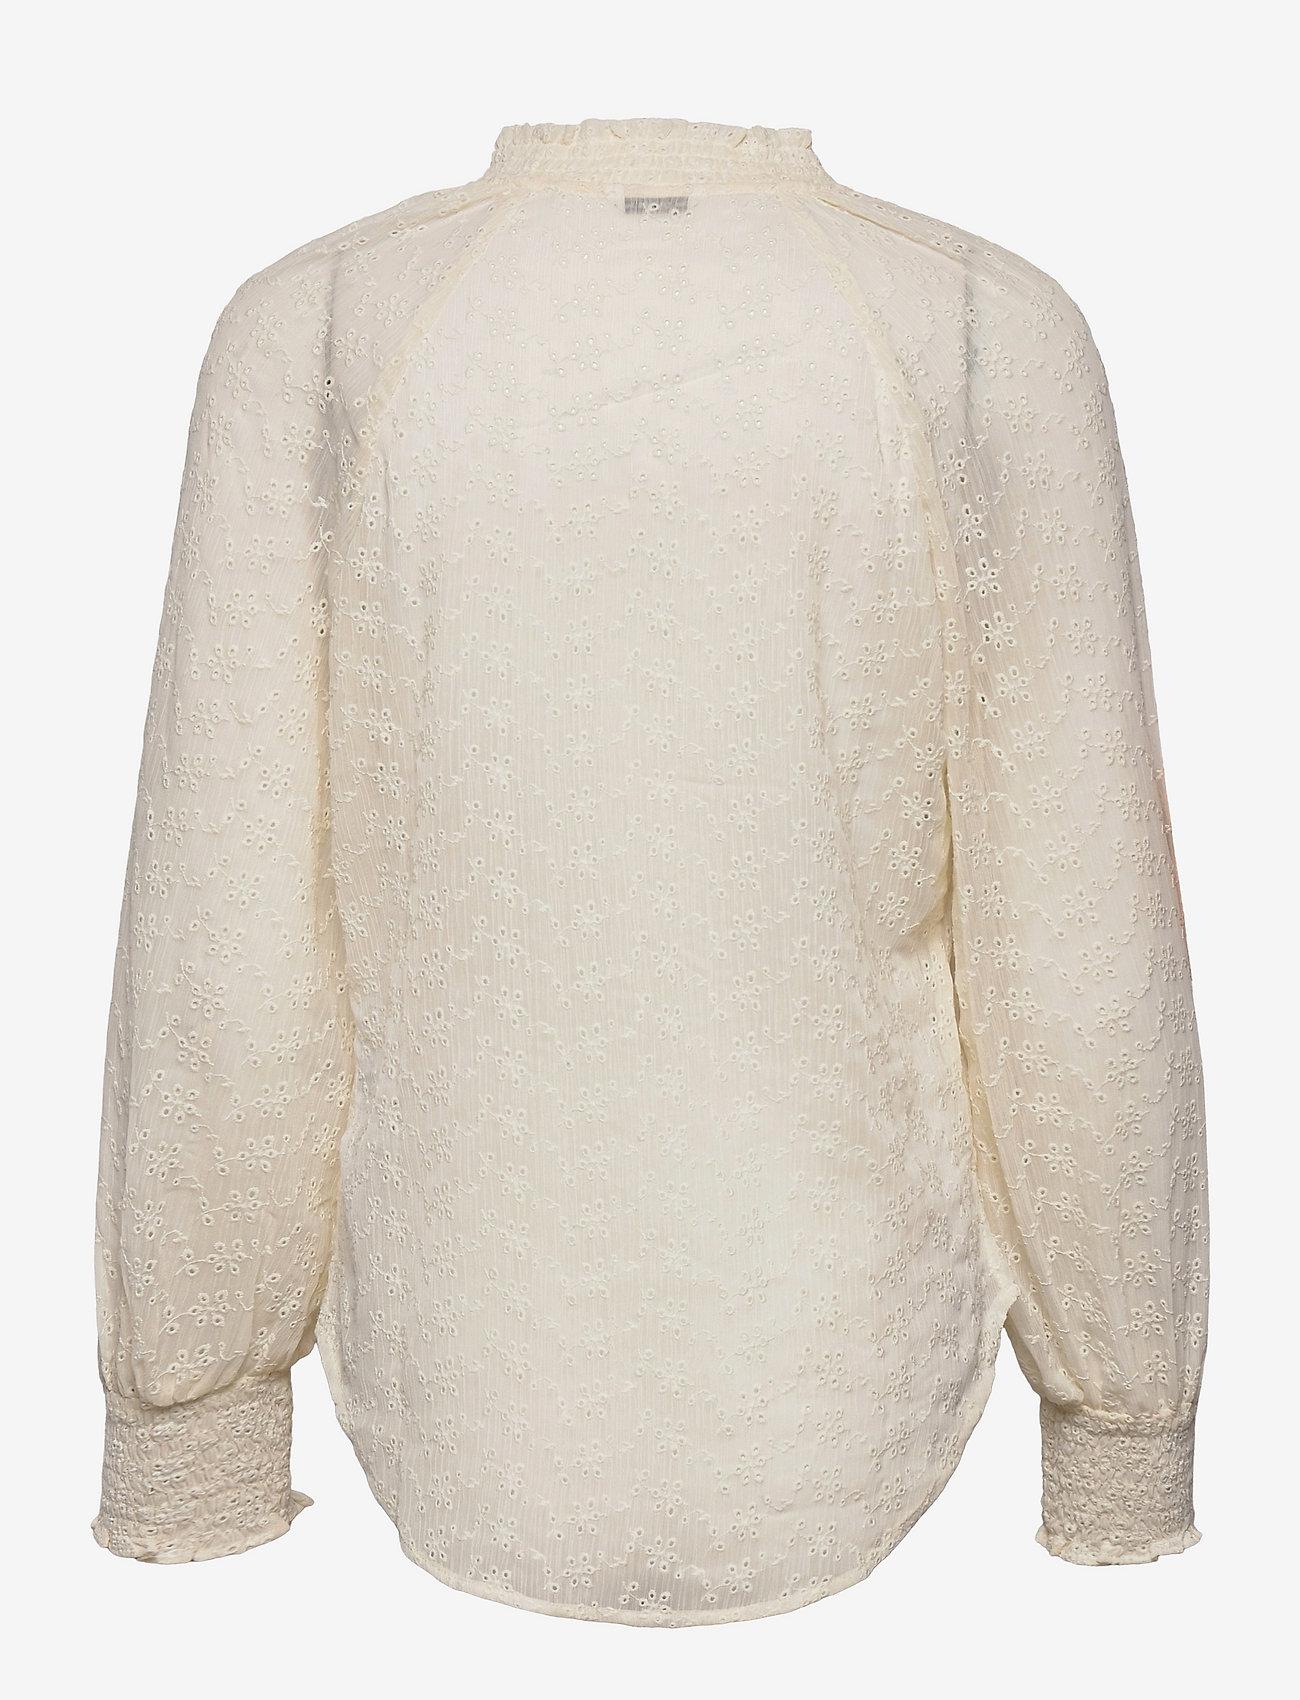 GUESS Jeans - 3 QTR SLV CHARISSE BLOUSE - långärmade blusar - cream white - 1